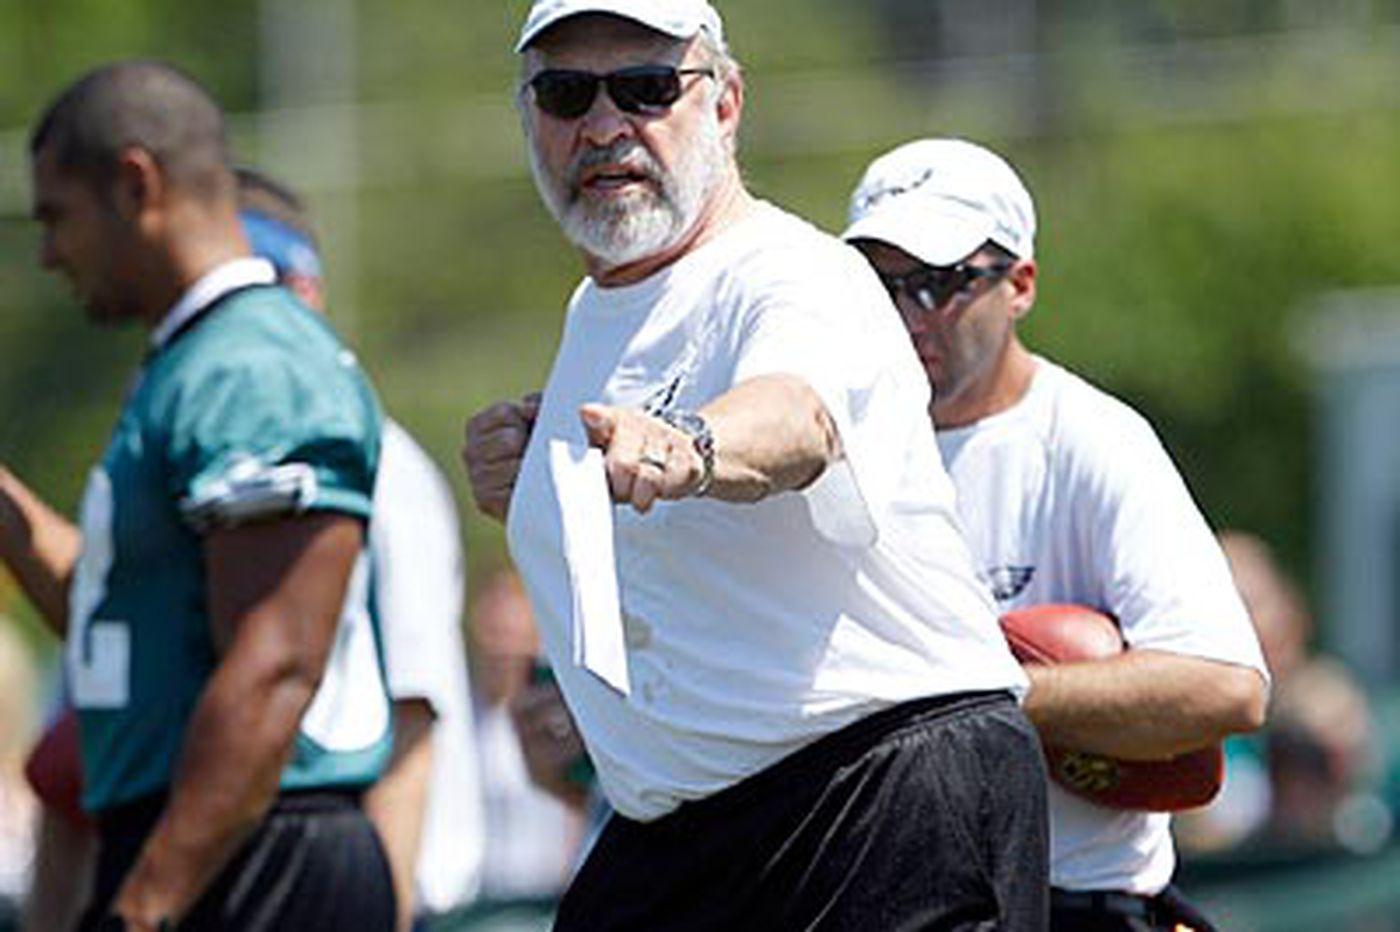 Will Eagles' Howard Mudd return next season?